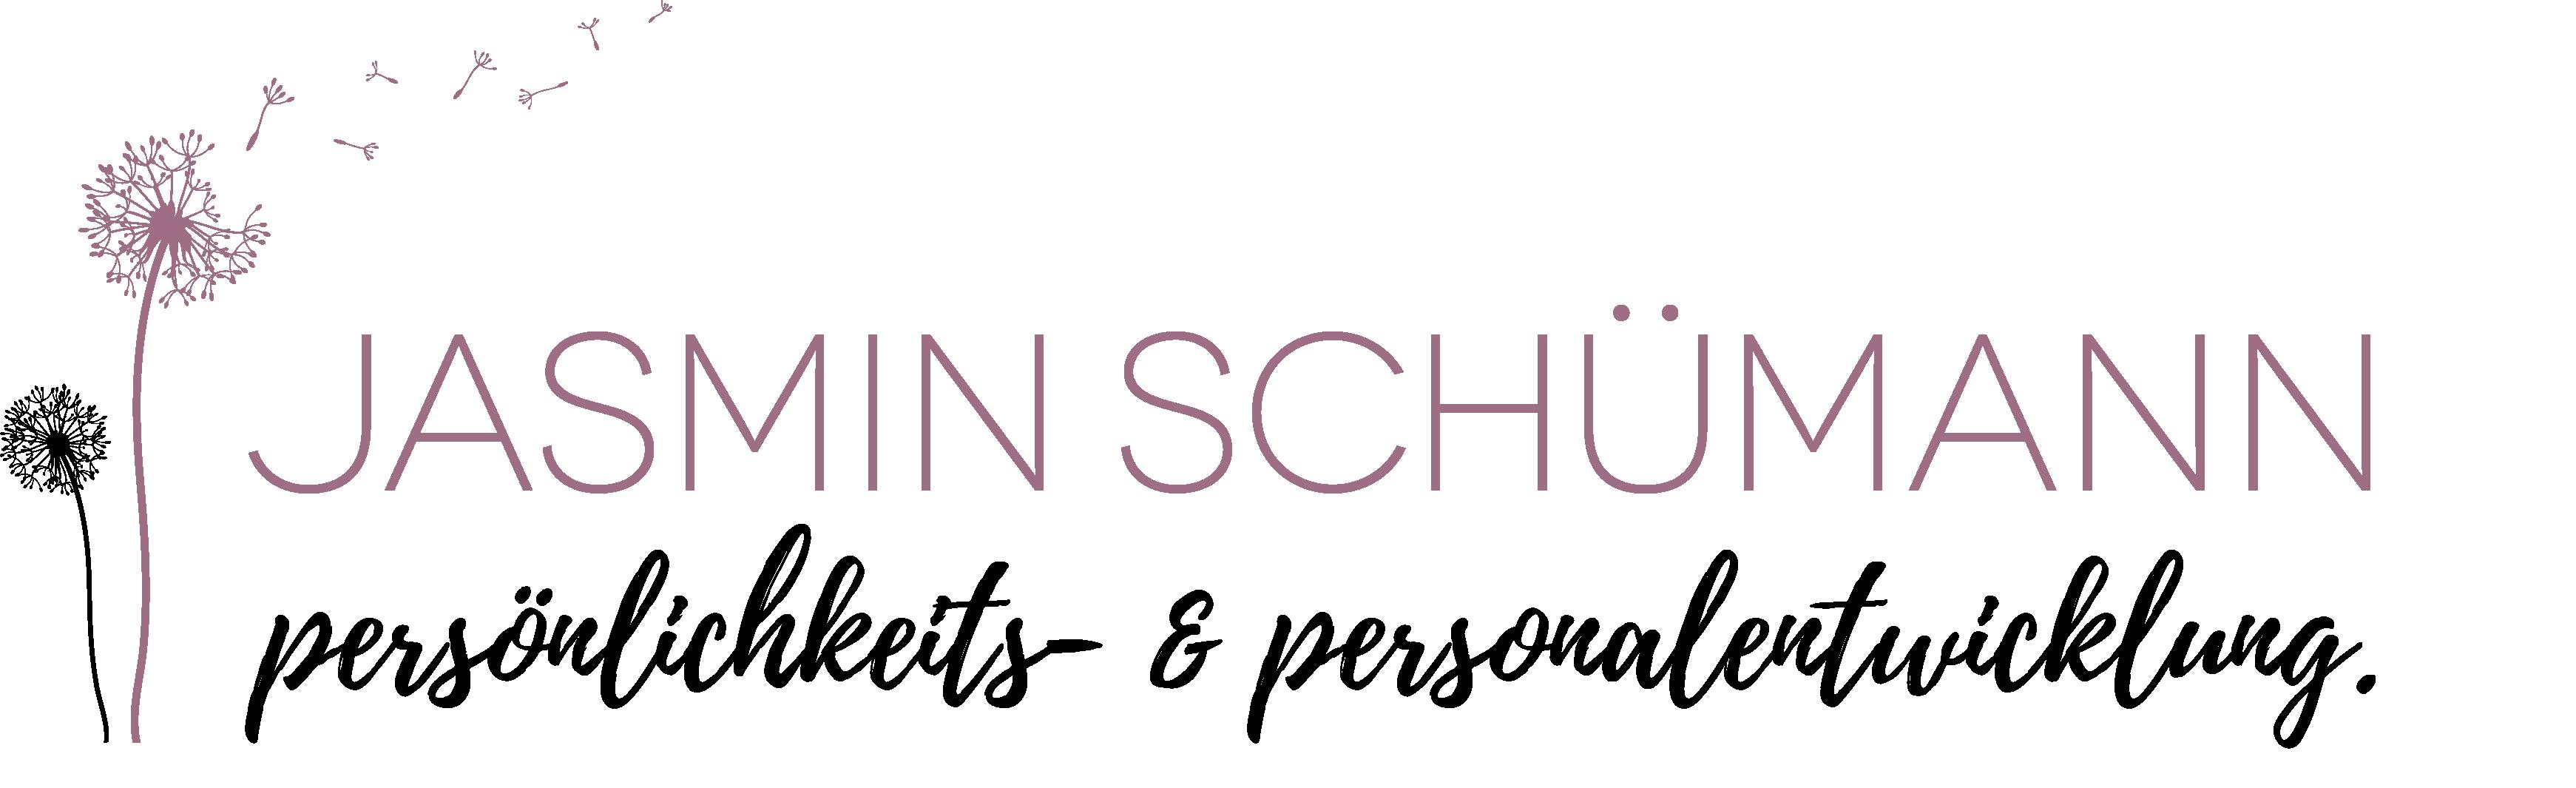 Jasmin Schümann